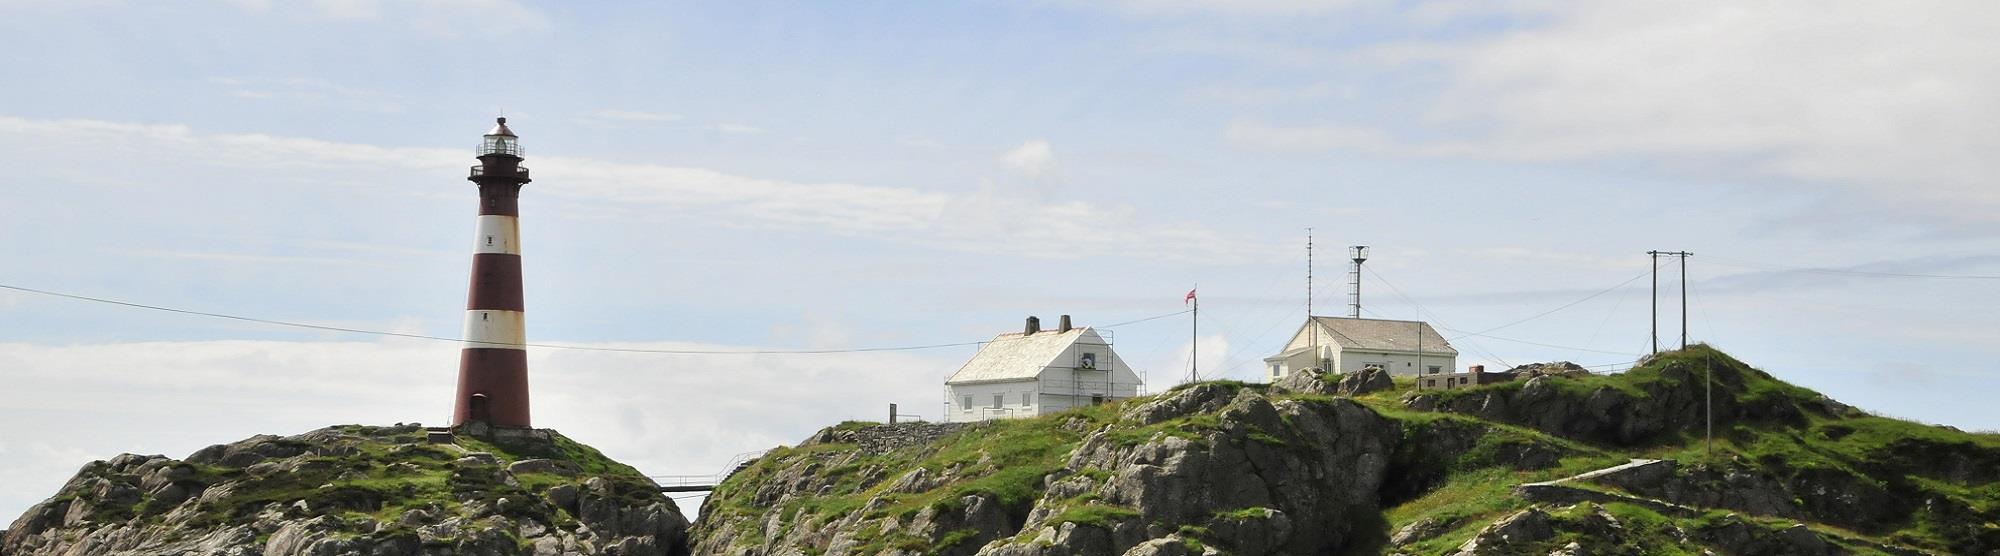 Hellisøy lighthouse - Fedje